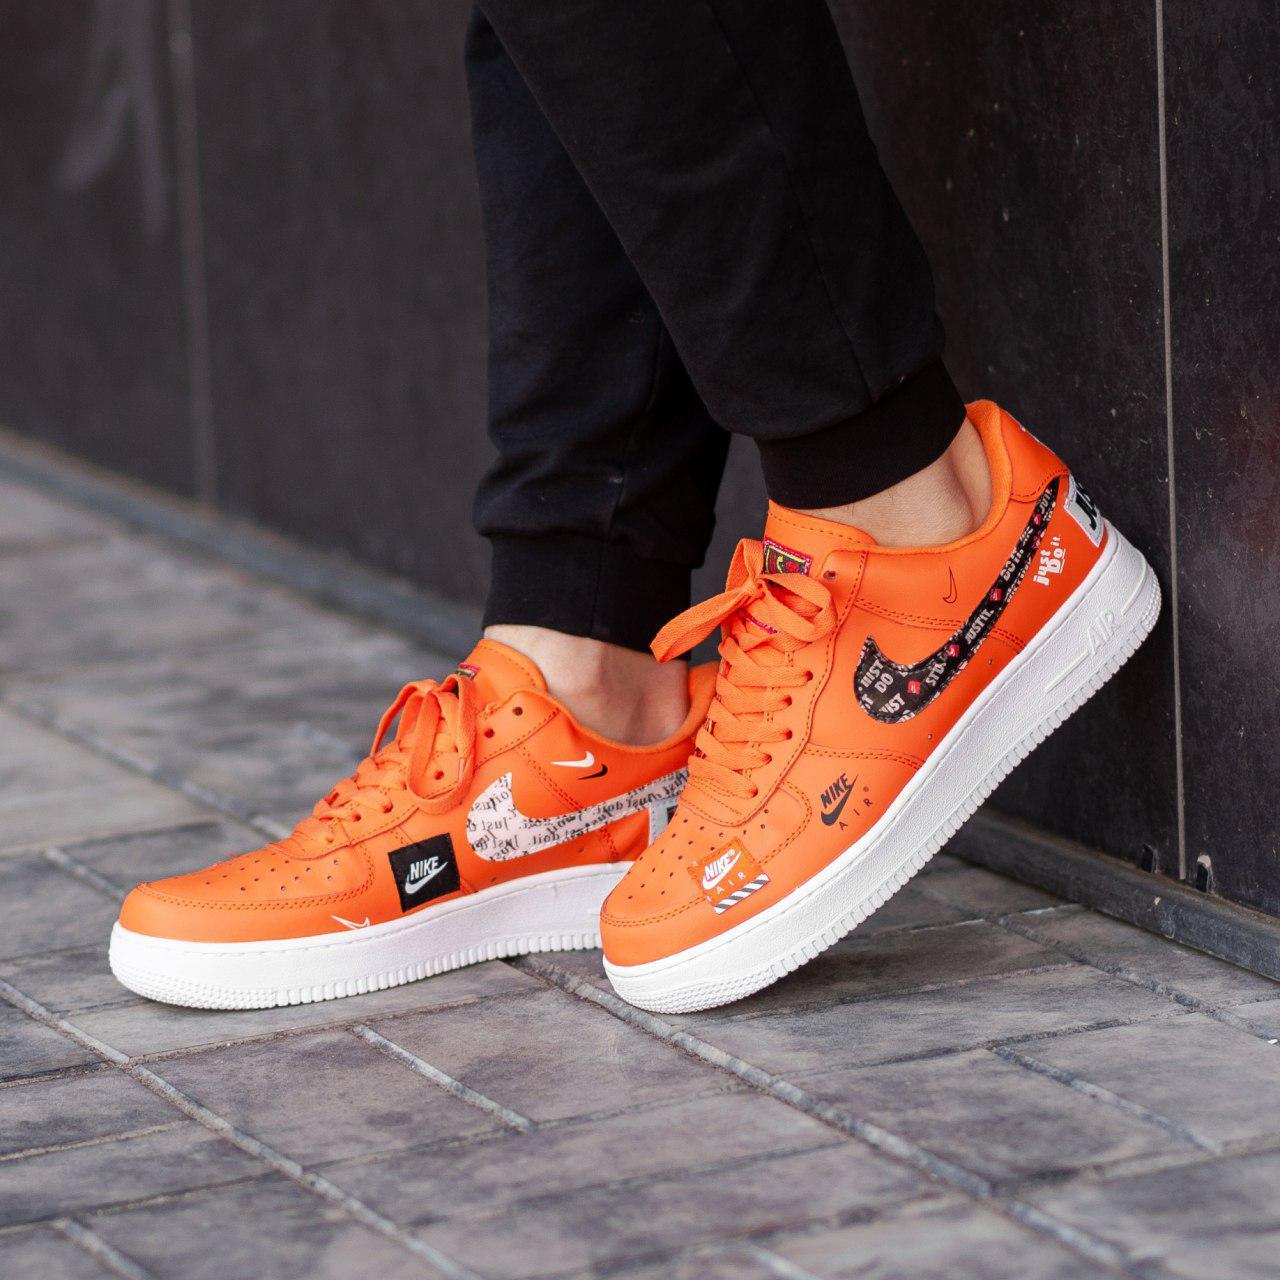 Кроссовки мужские в стиле Nike Air Force Just do it Orange (Реплика ААА+)